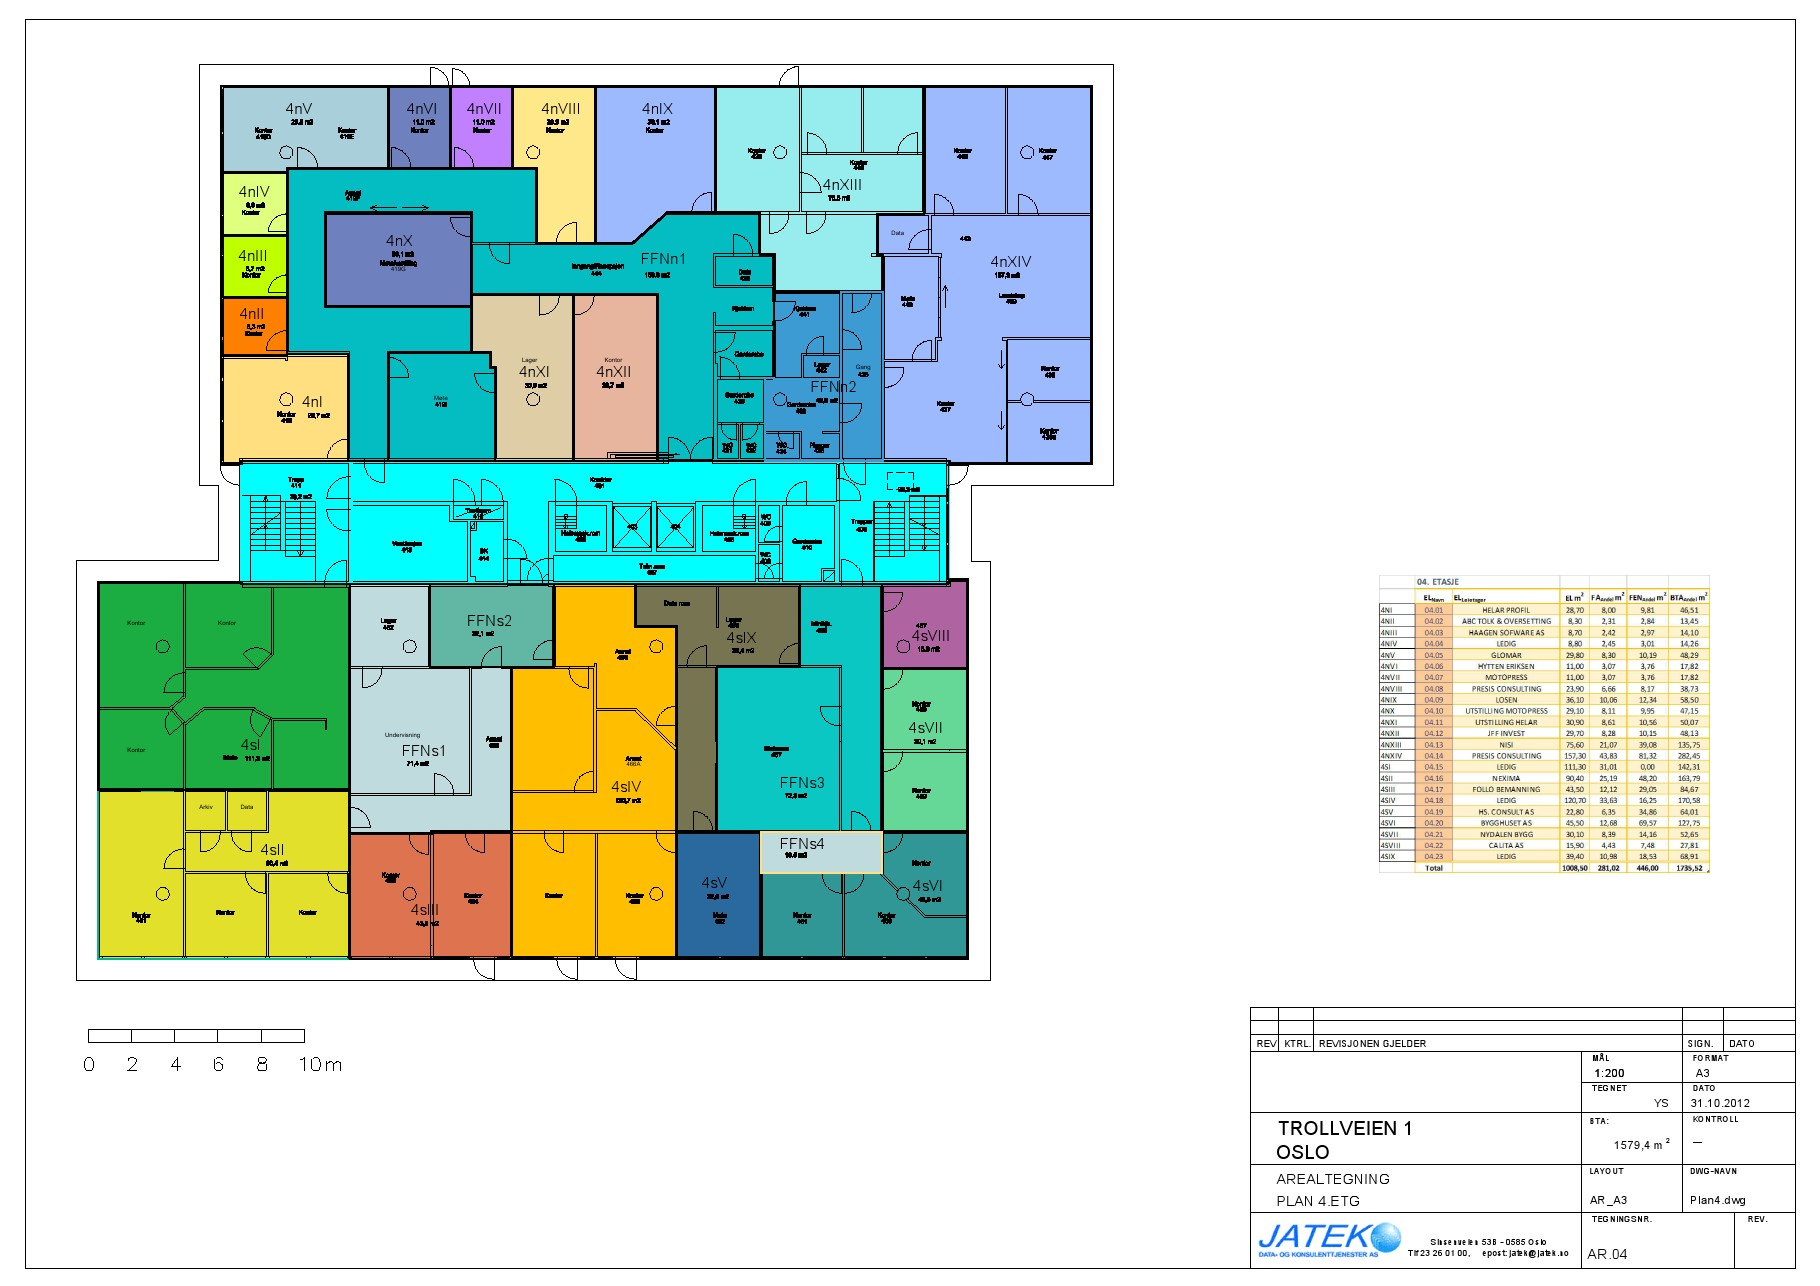 Arealplaner og arealberegning